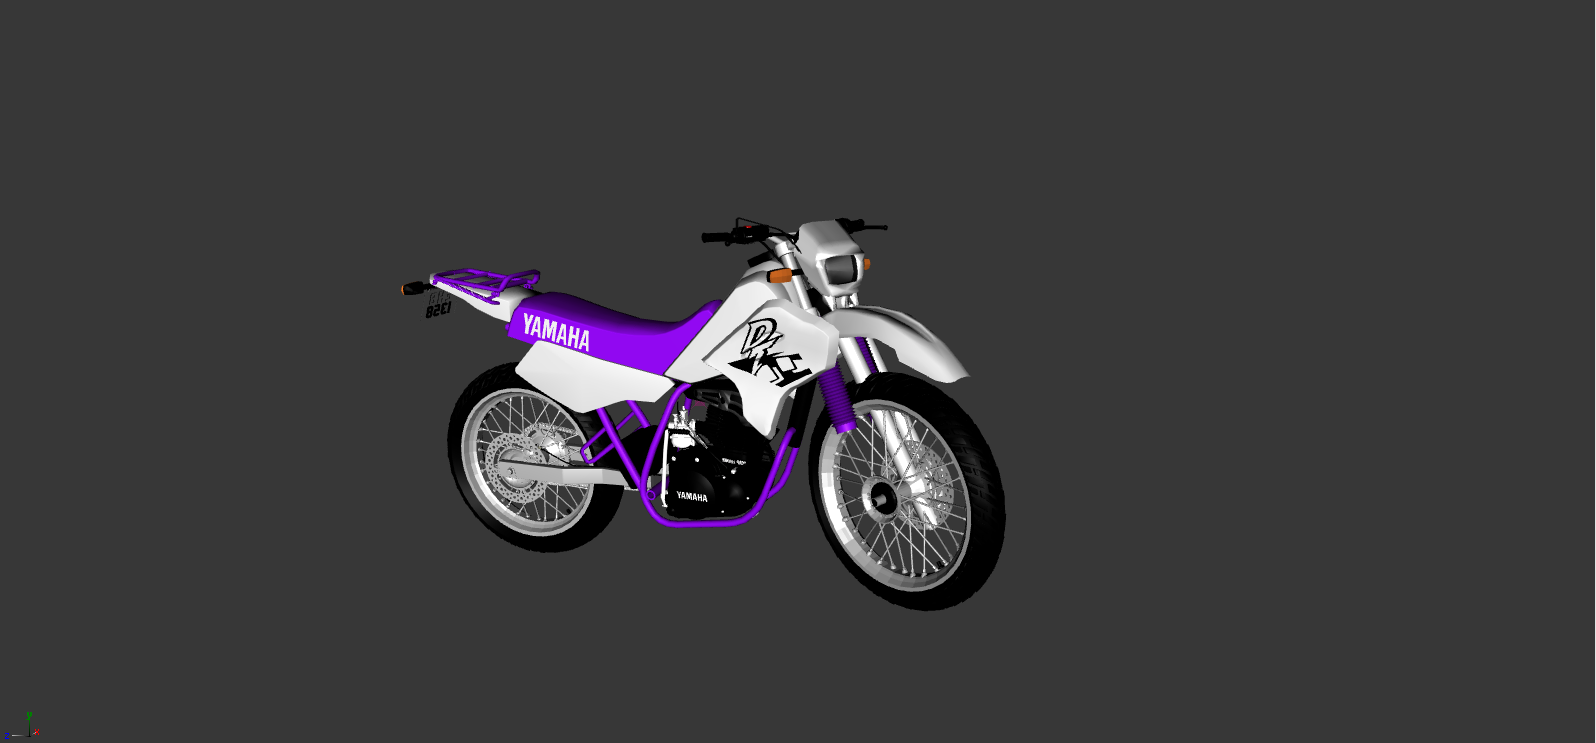 Yamaha  Sii